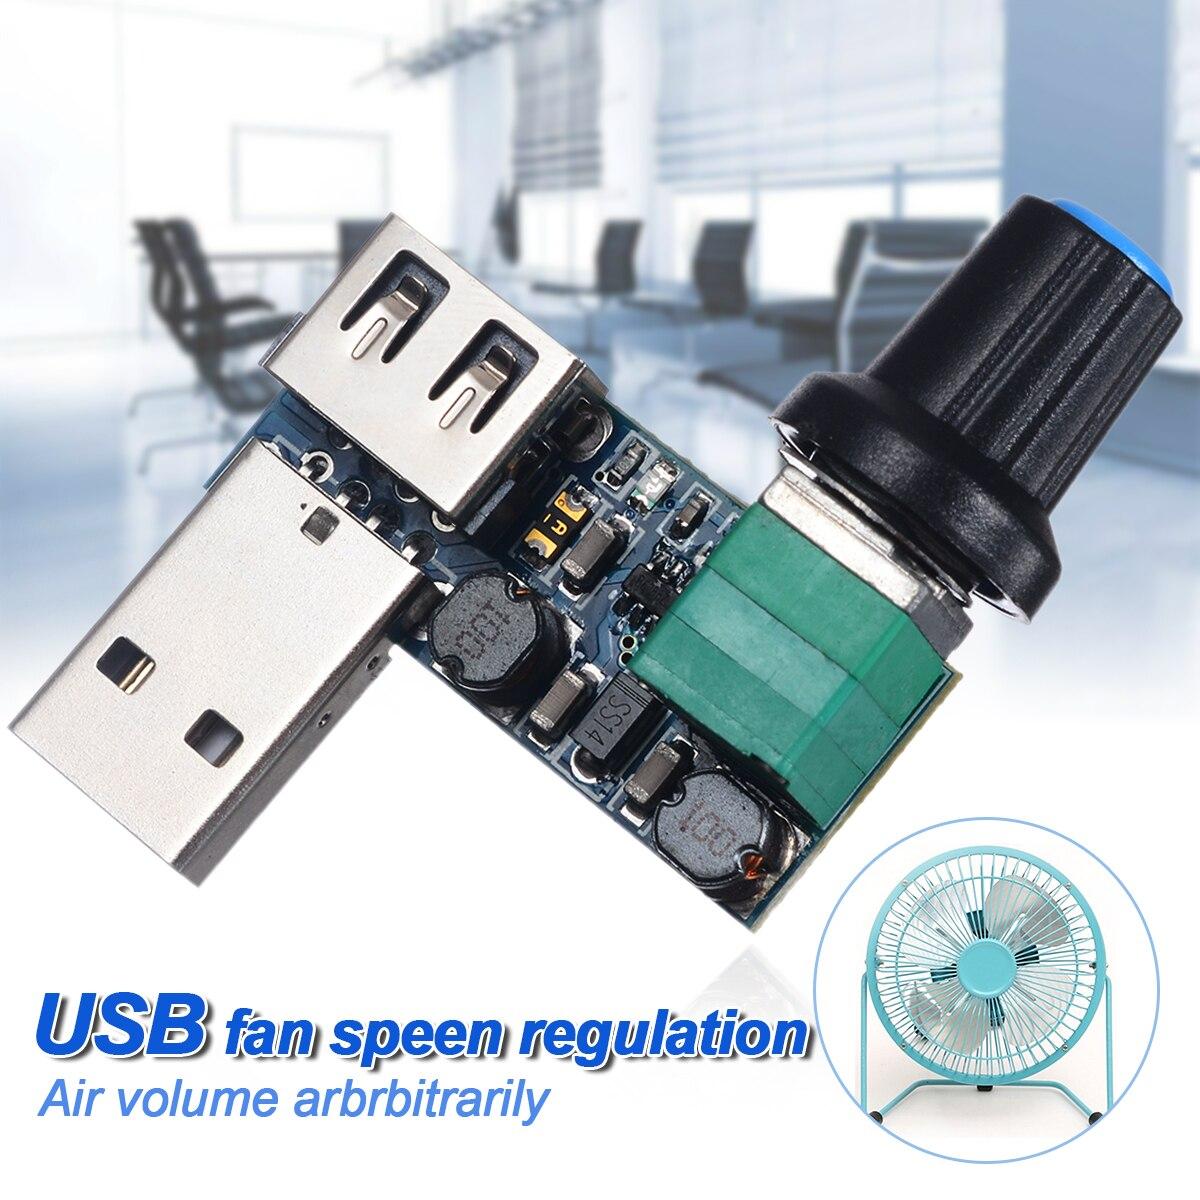 5V To 12V USB Fan Speed Controller Switch Mayitr Fan Stepless Speed Controller Speed Variable Regulator Module